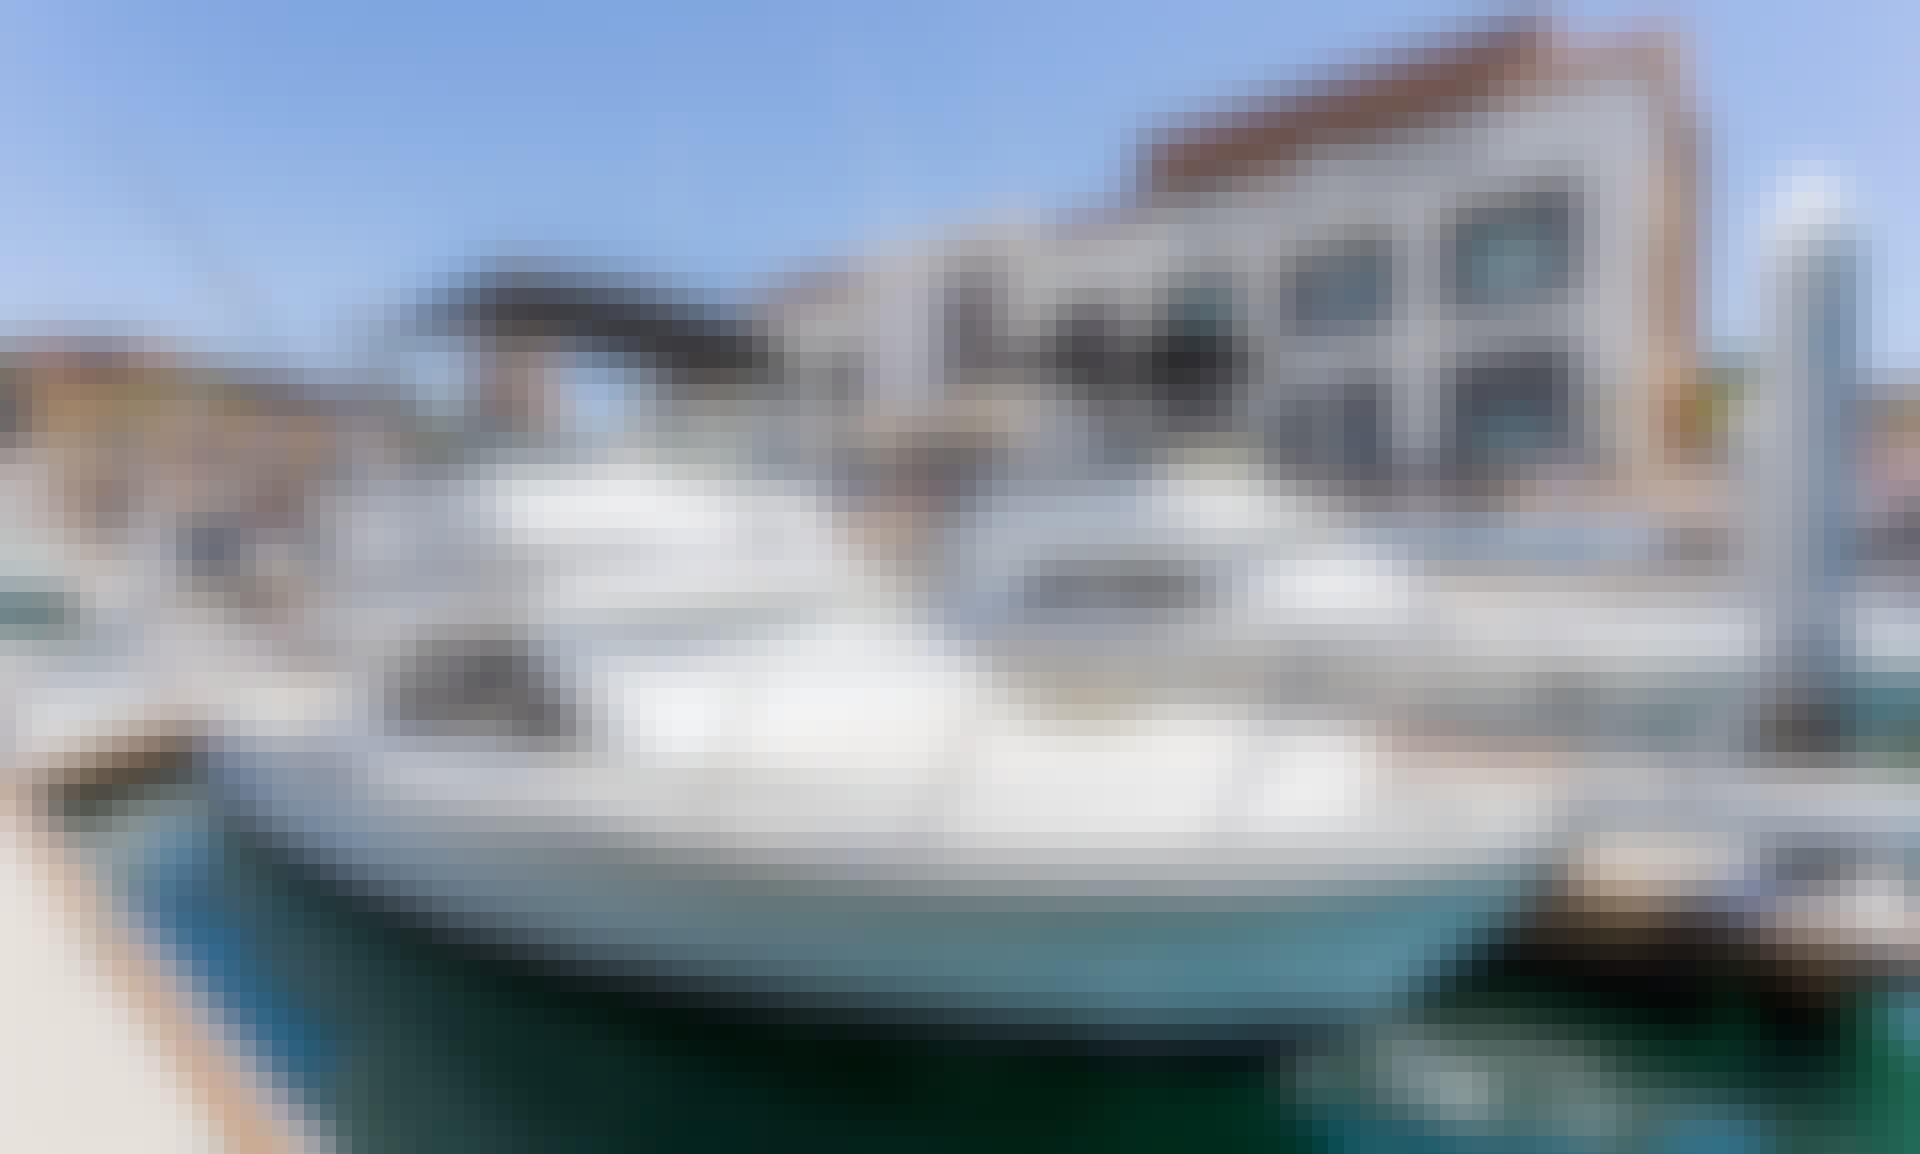 Jump aboard 29' Sport Fisherman for an Adventurous fishing charter in Baja California Sur, Mexico